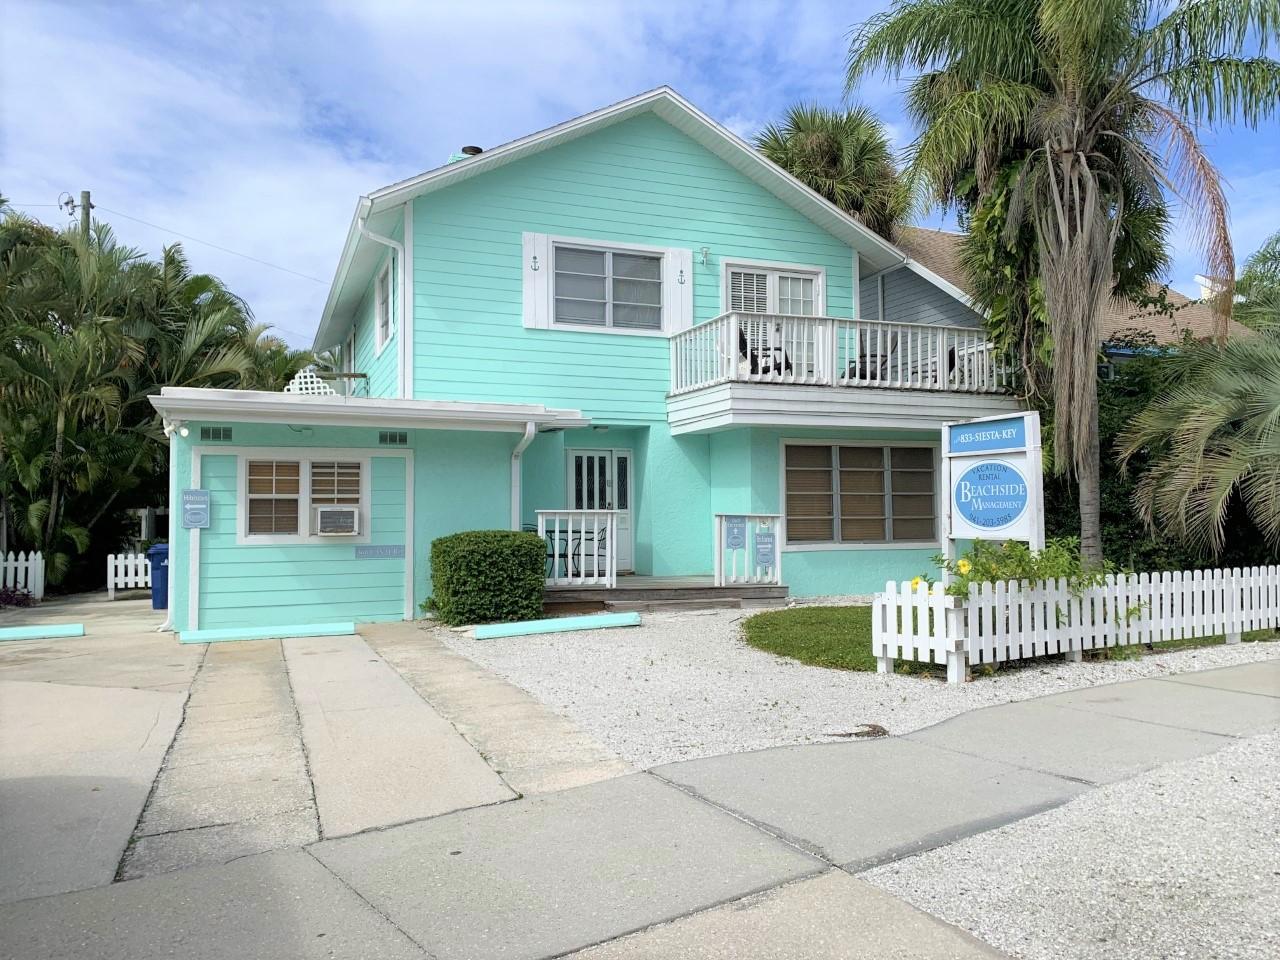 Hibiscus - Siesta Key Vacation Rentals